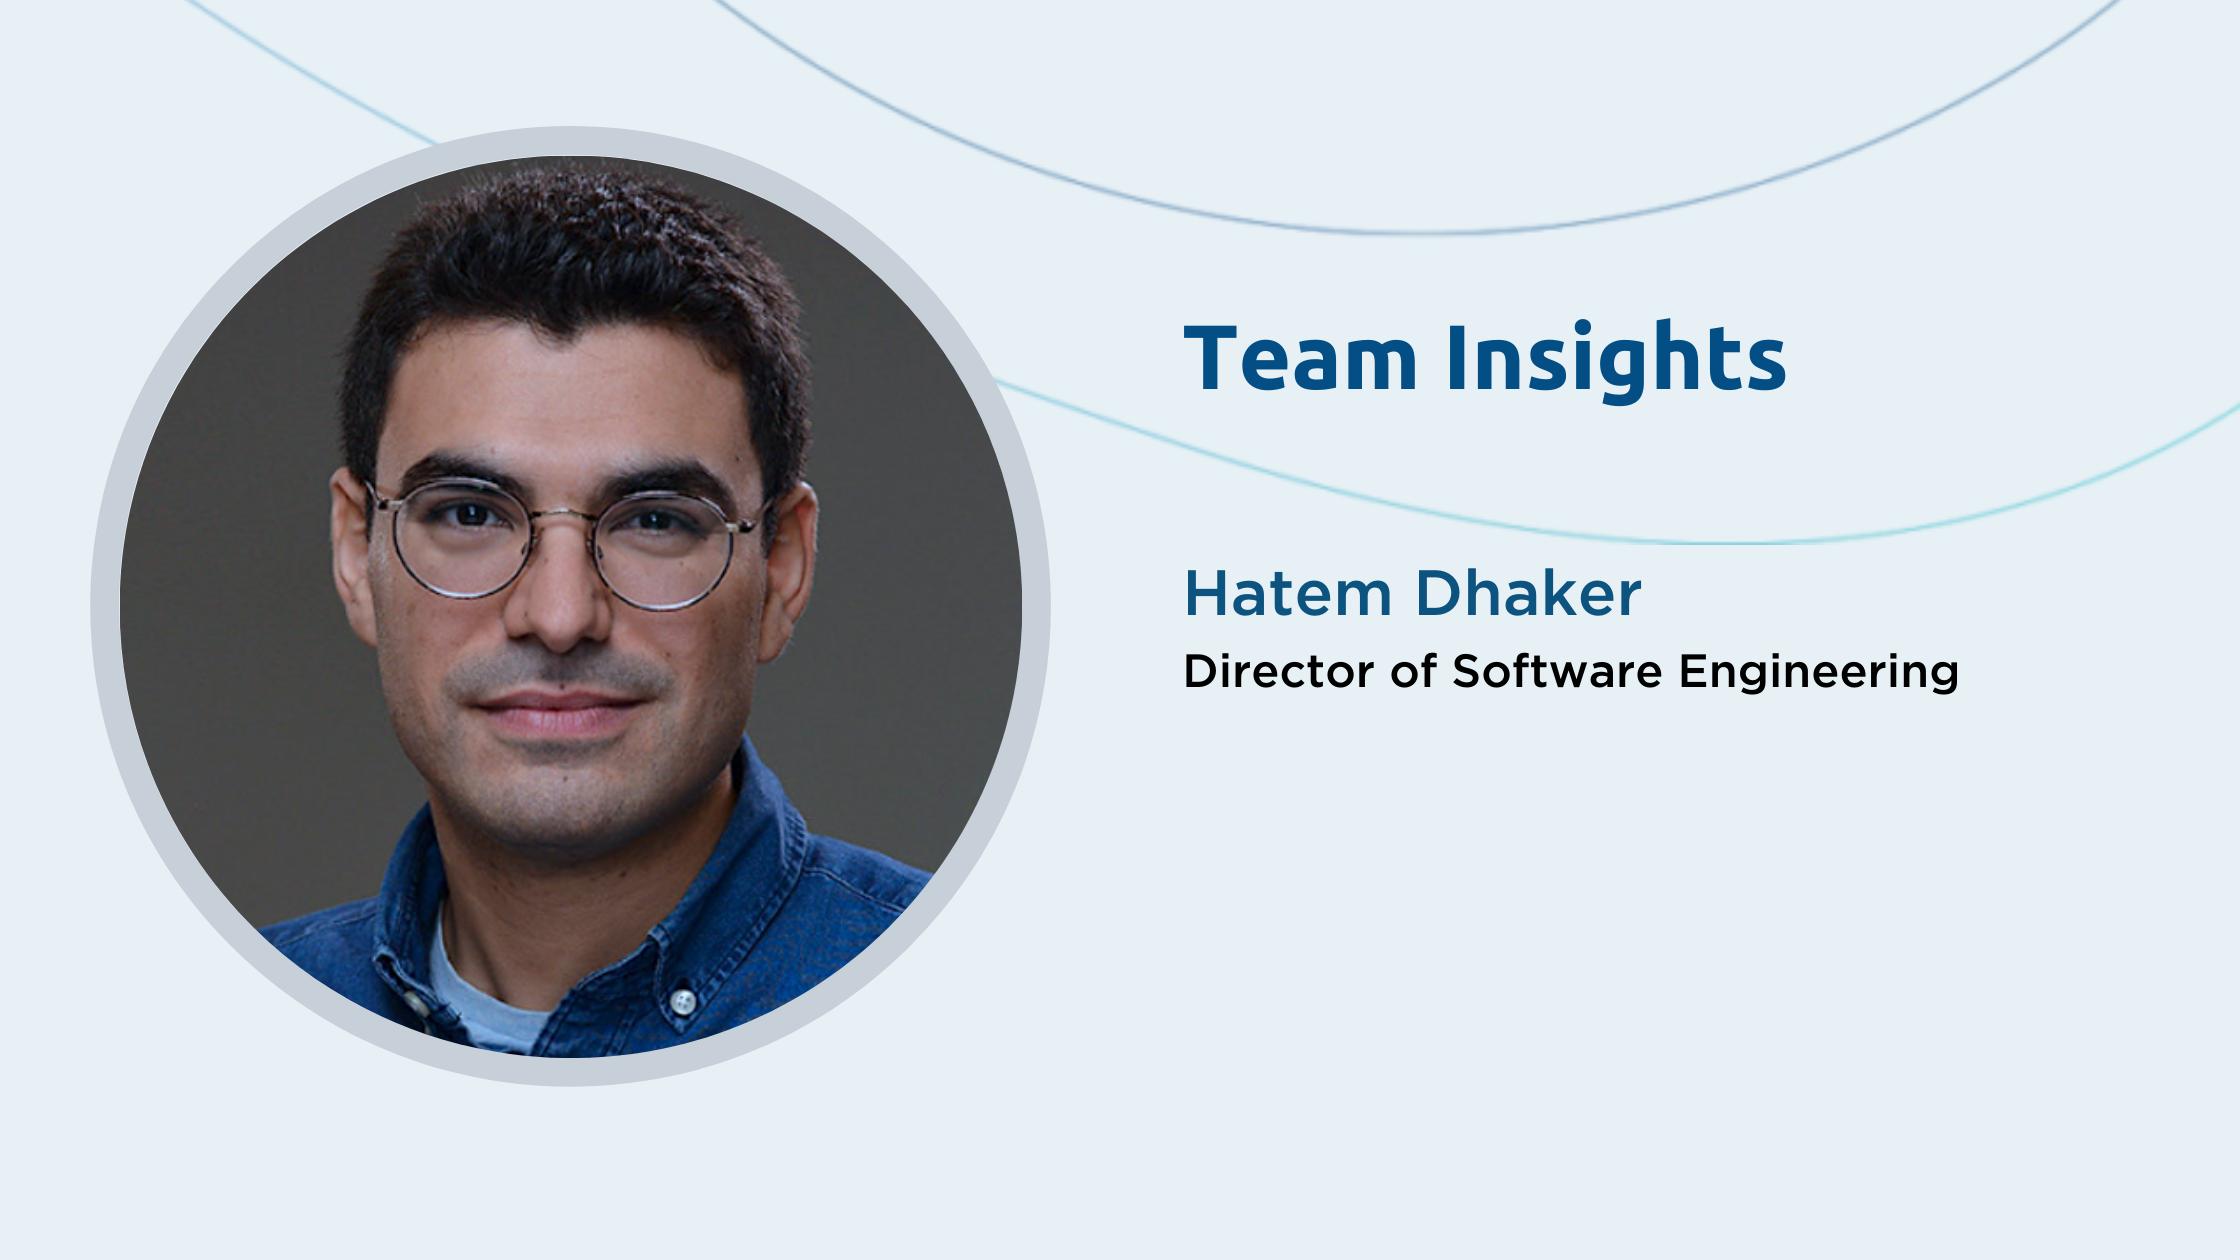 Team Insights: Hatem Dhaker